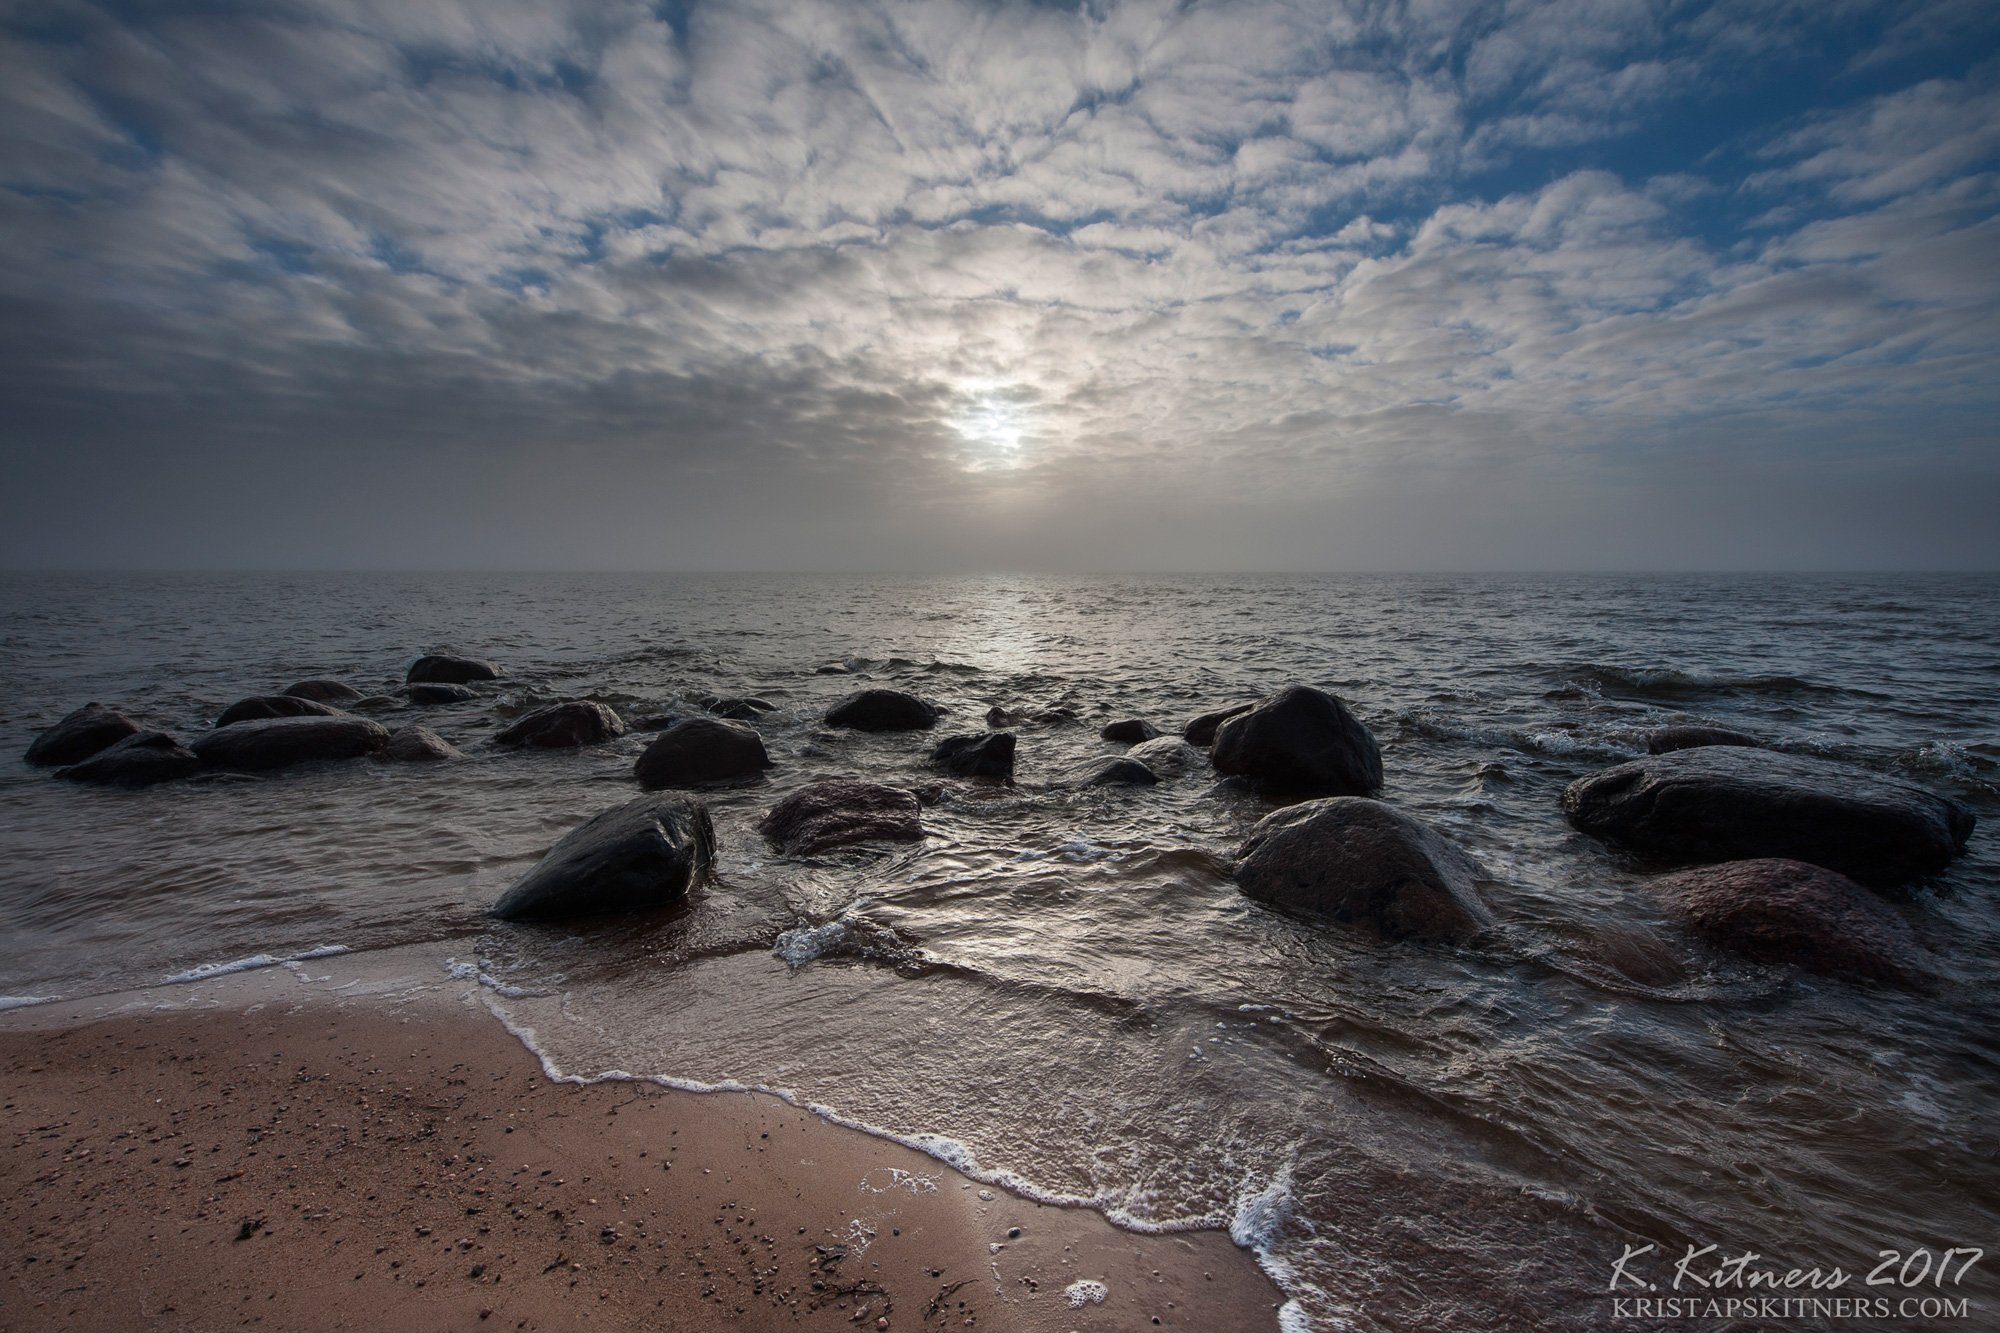 sea seascape fog smoke sun light water sky clouds stone reflection latvia, Kristaps Kitners